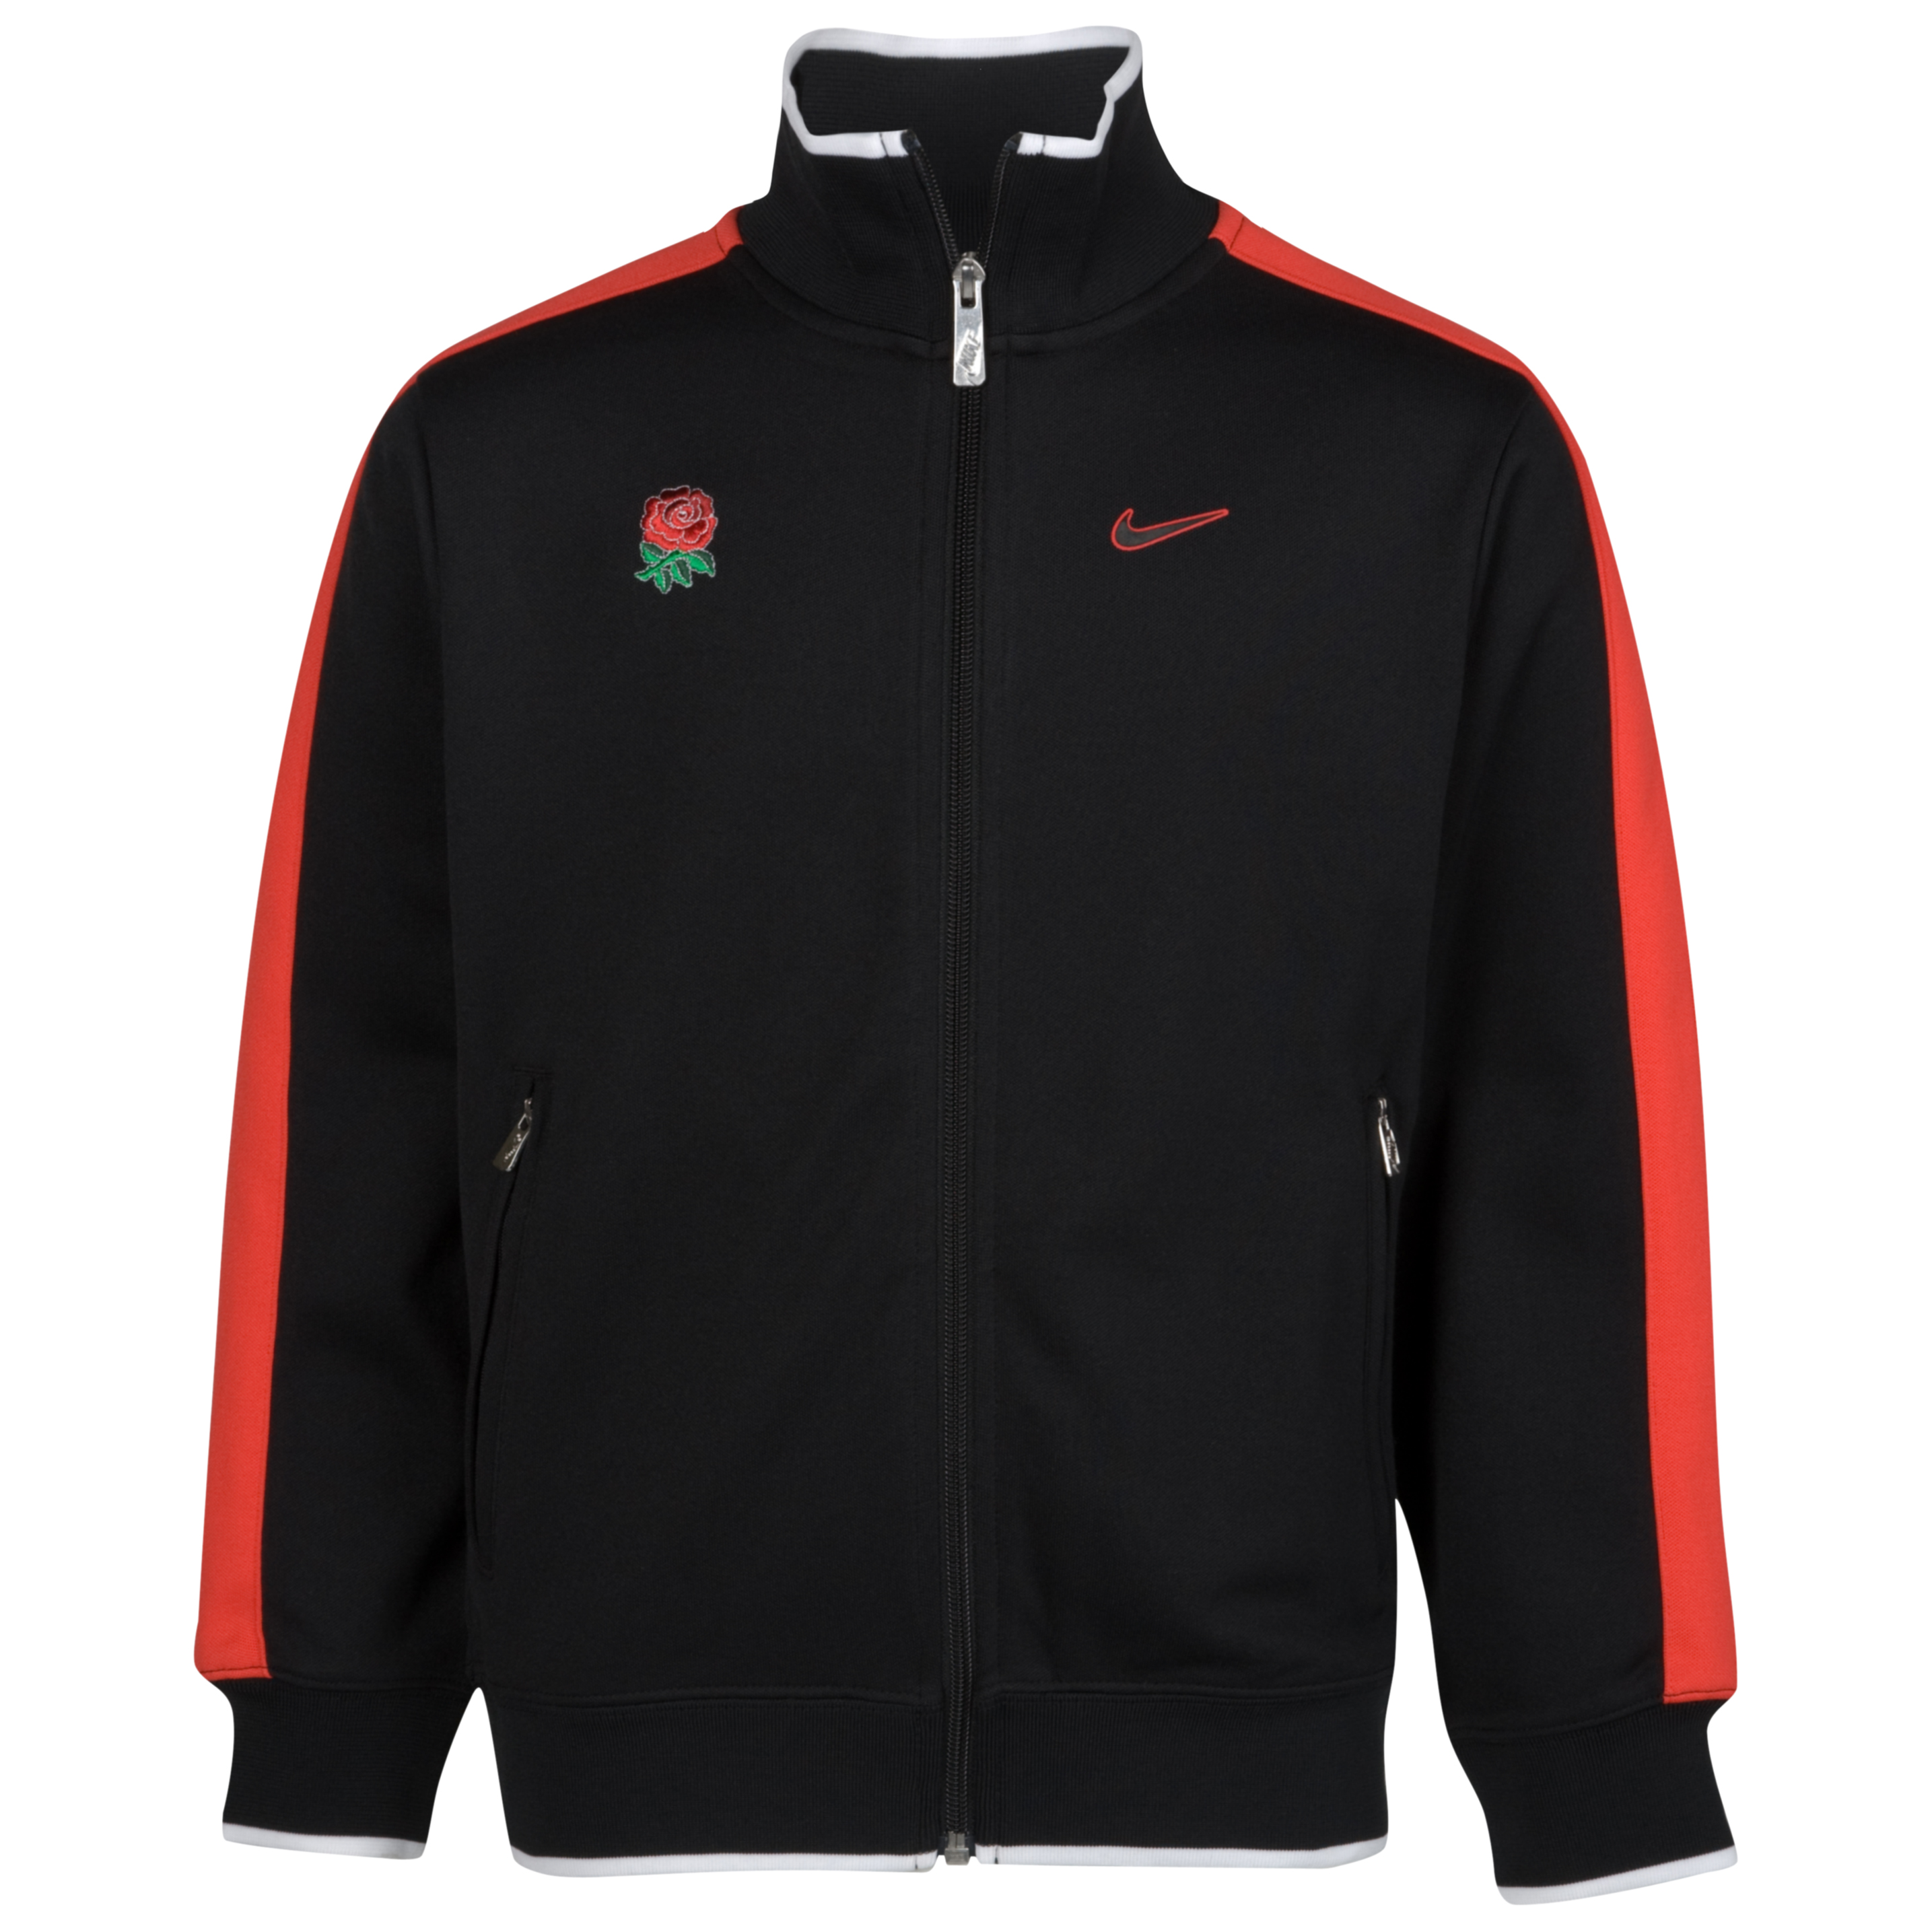 England Rugby Nike Golf Club Jacket - Kids. for 35€